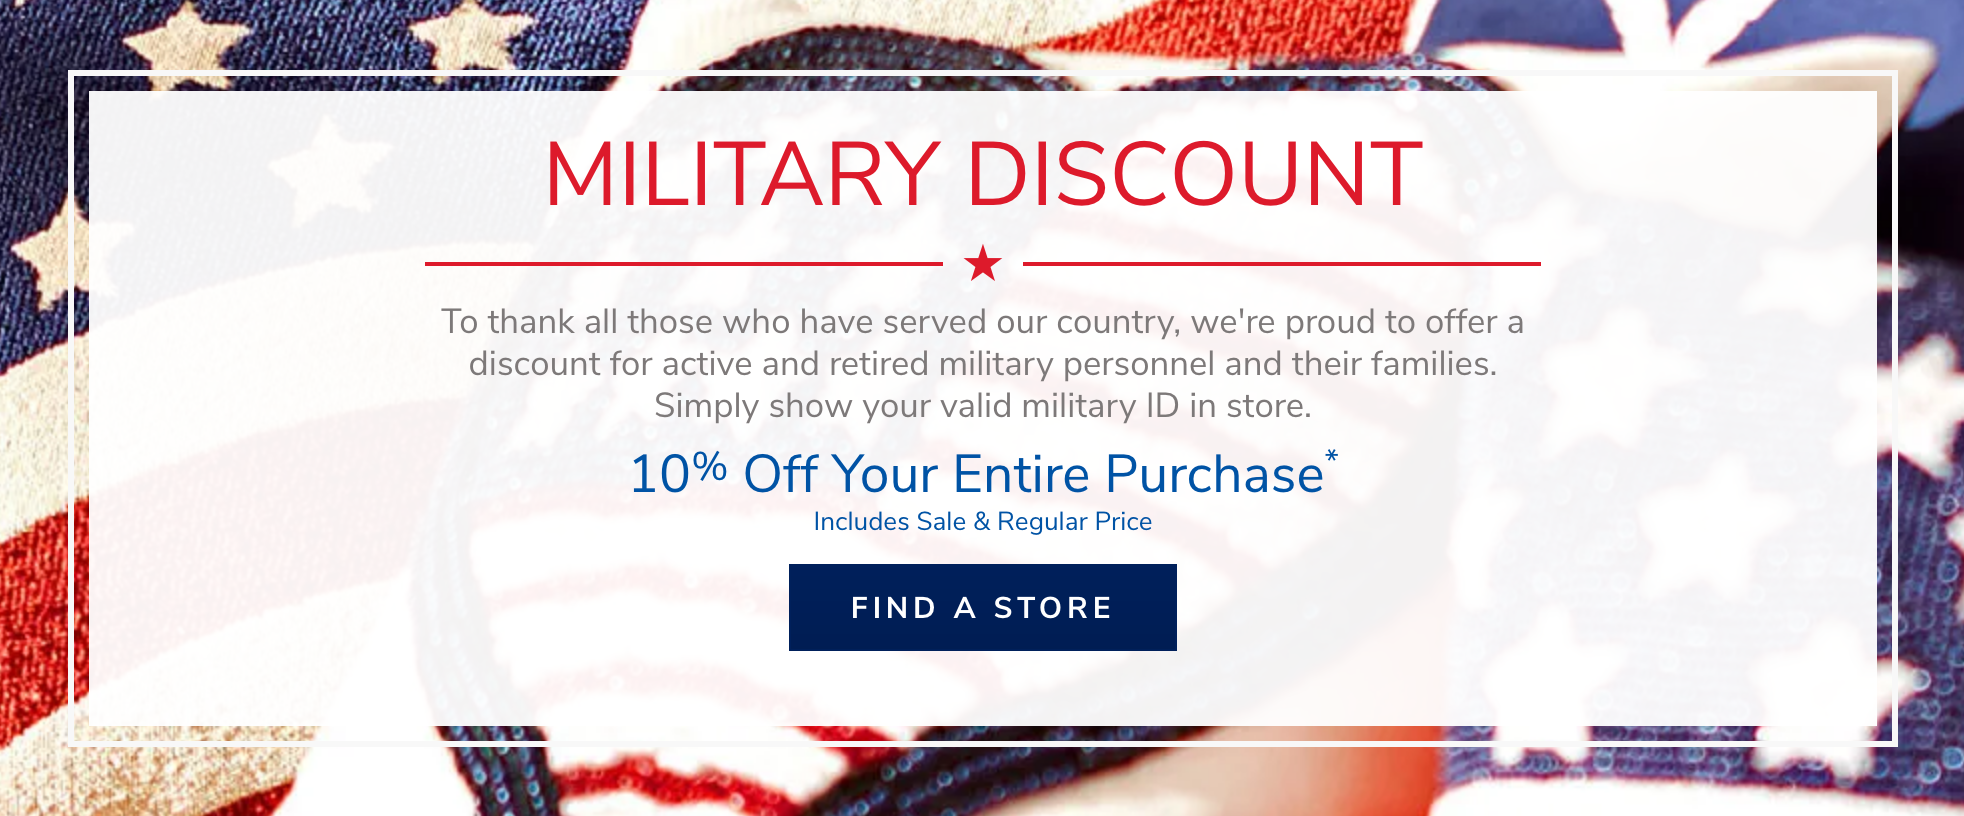 Pier 1 Military Veteran Discounts